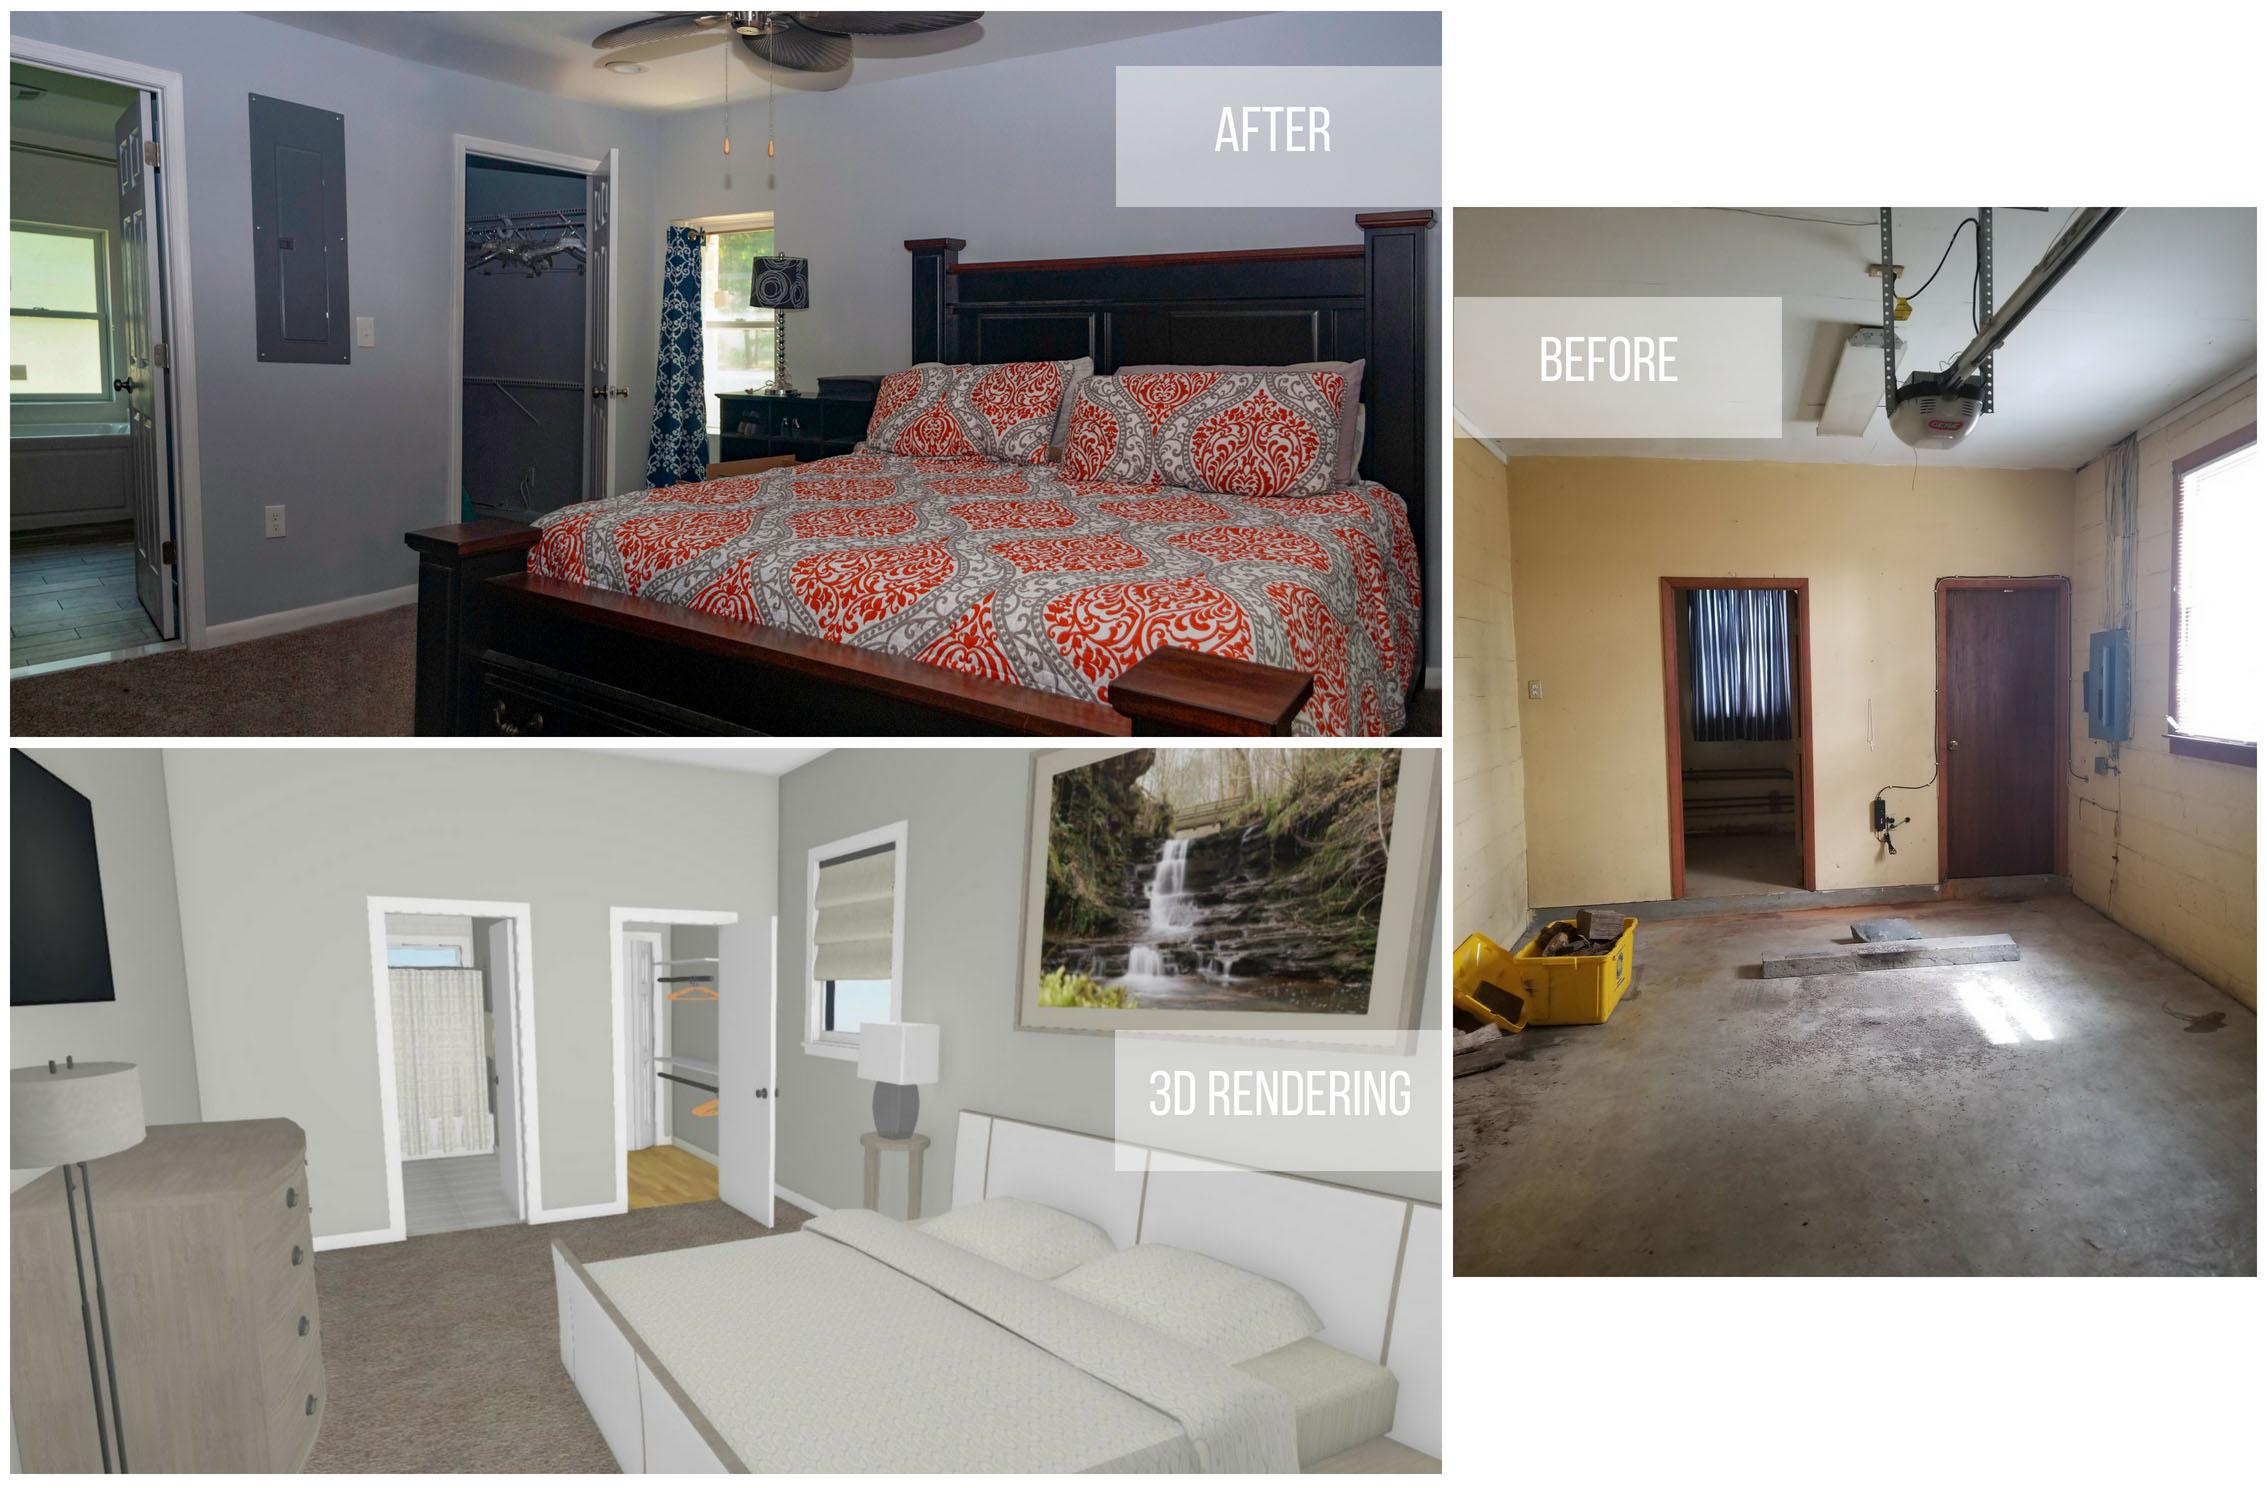 cohasset bedroom comparison.jpg